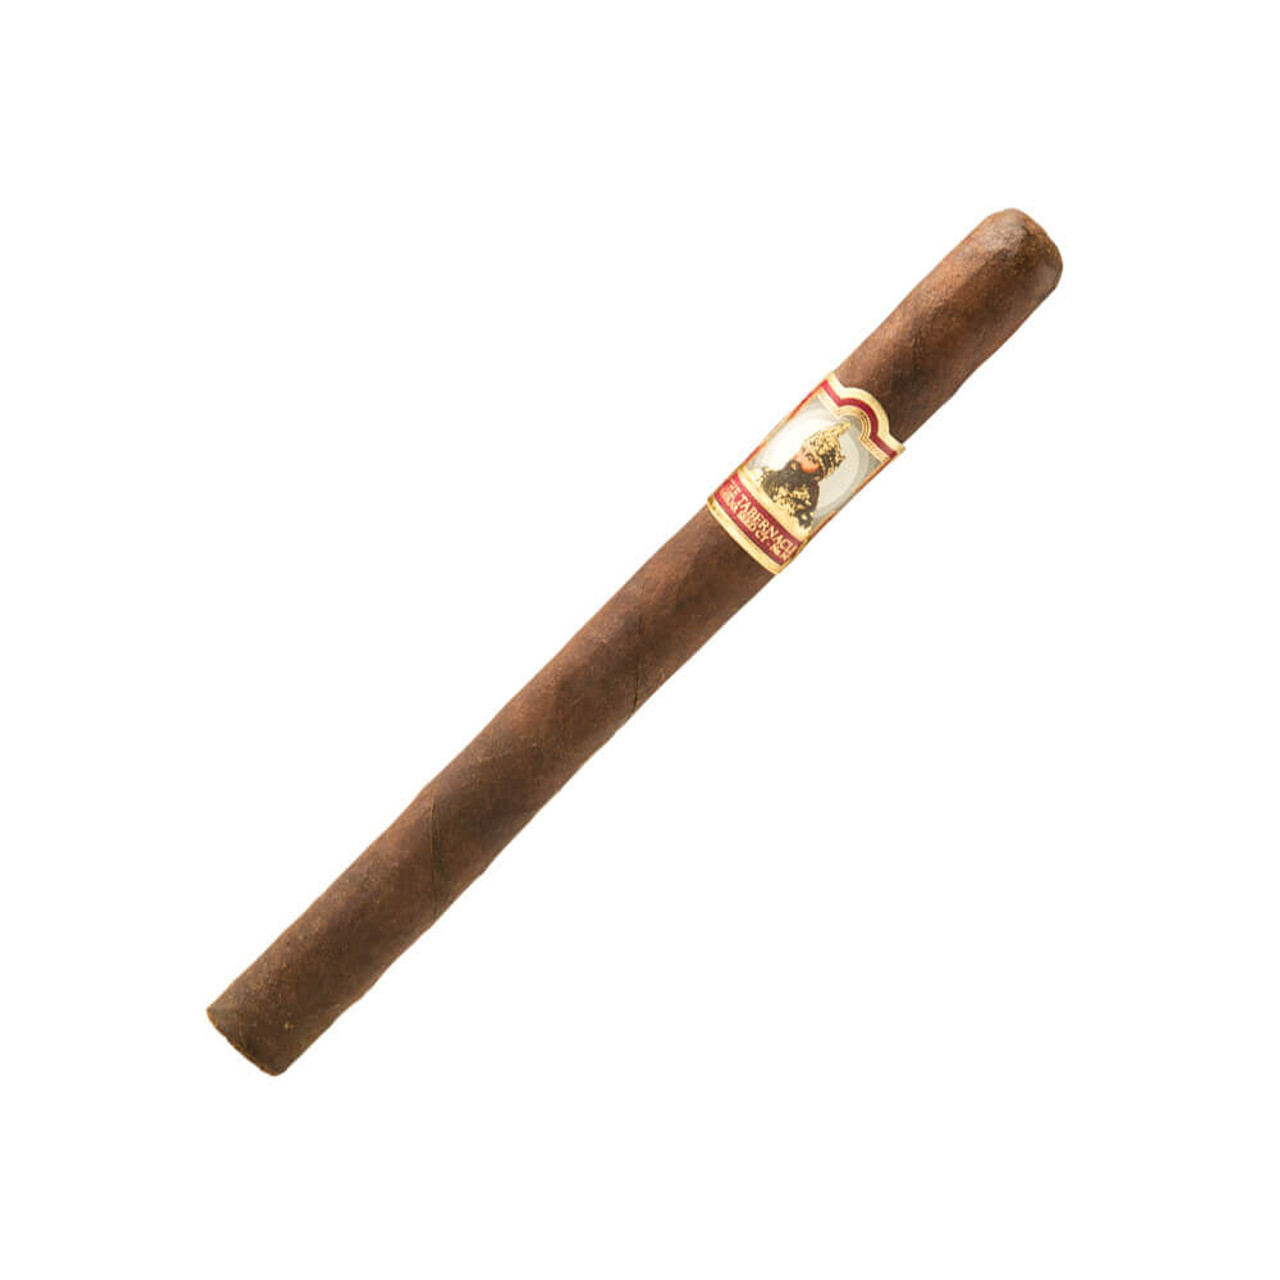 Foundation The Tabernacle No. 142 Havana Seed CT Lancero Cigars - 7 x 40 (Box of 24)